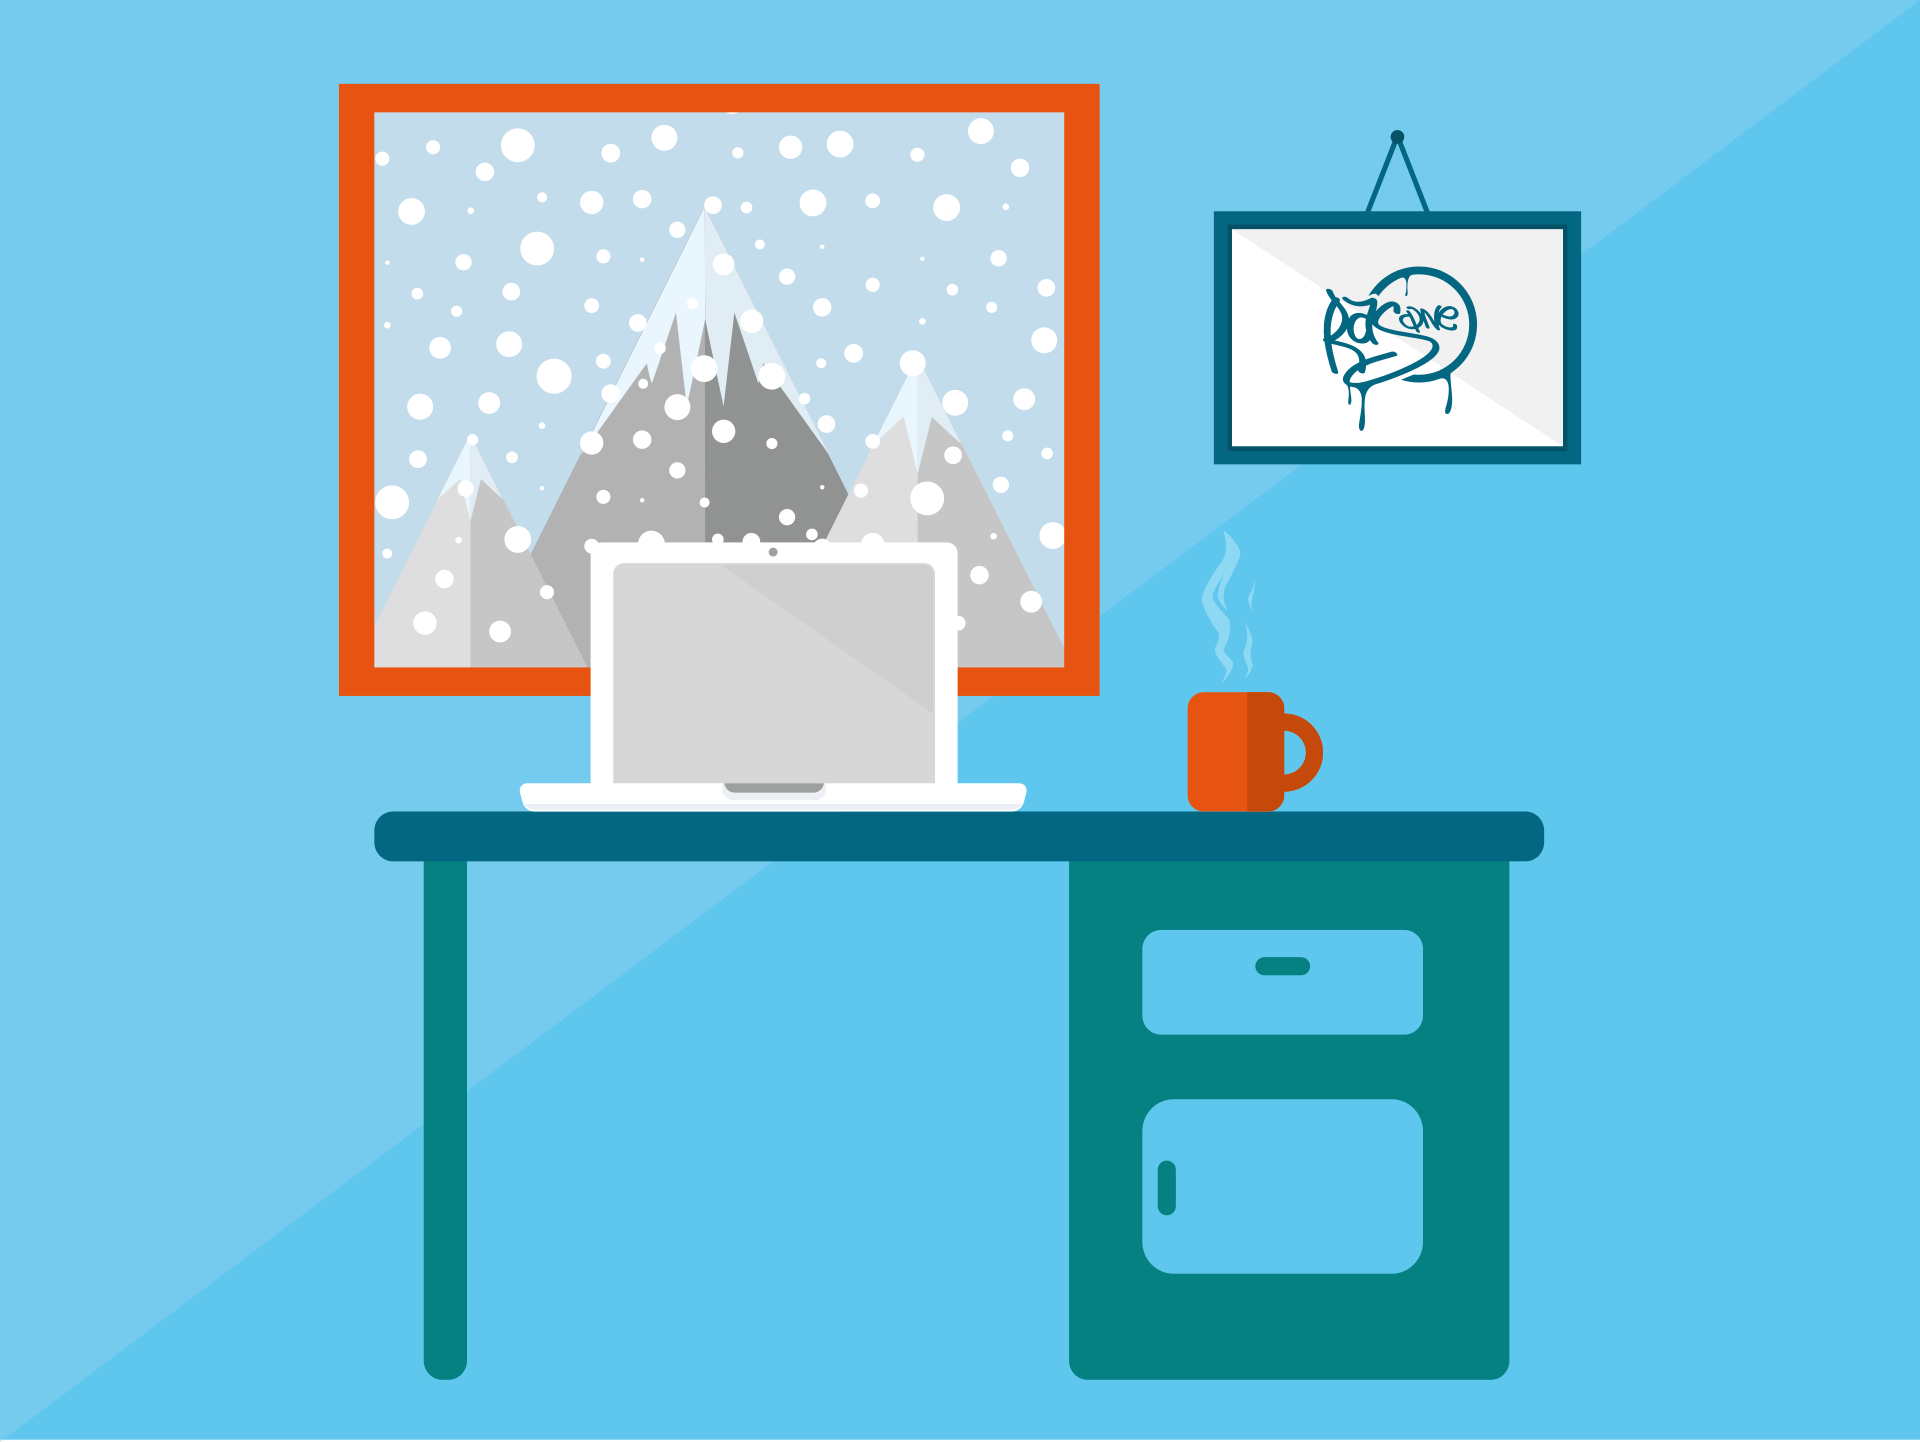 office 2420247 - WordPress個人ブログ運営におすすめの安いレンタルサーバーは?設定から移行方法まで初心者に解説